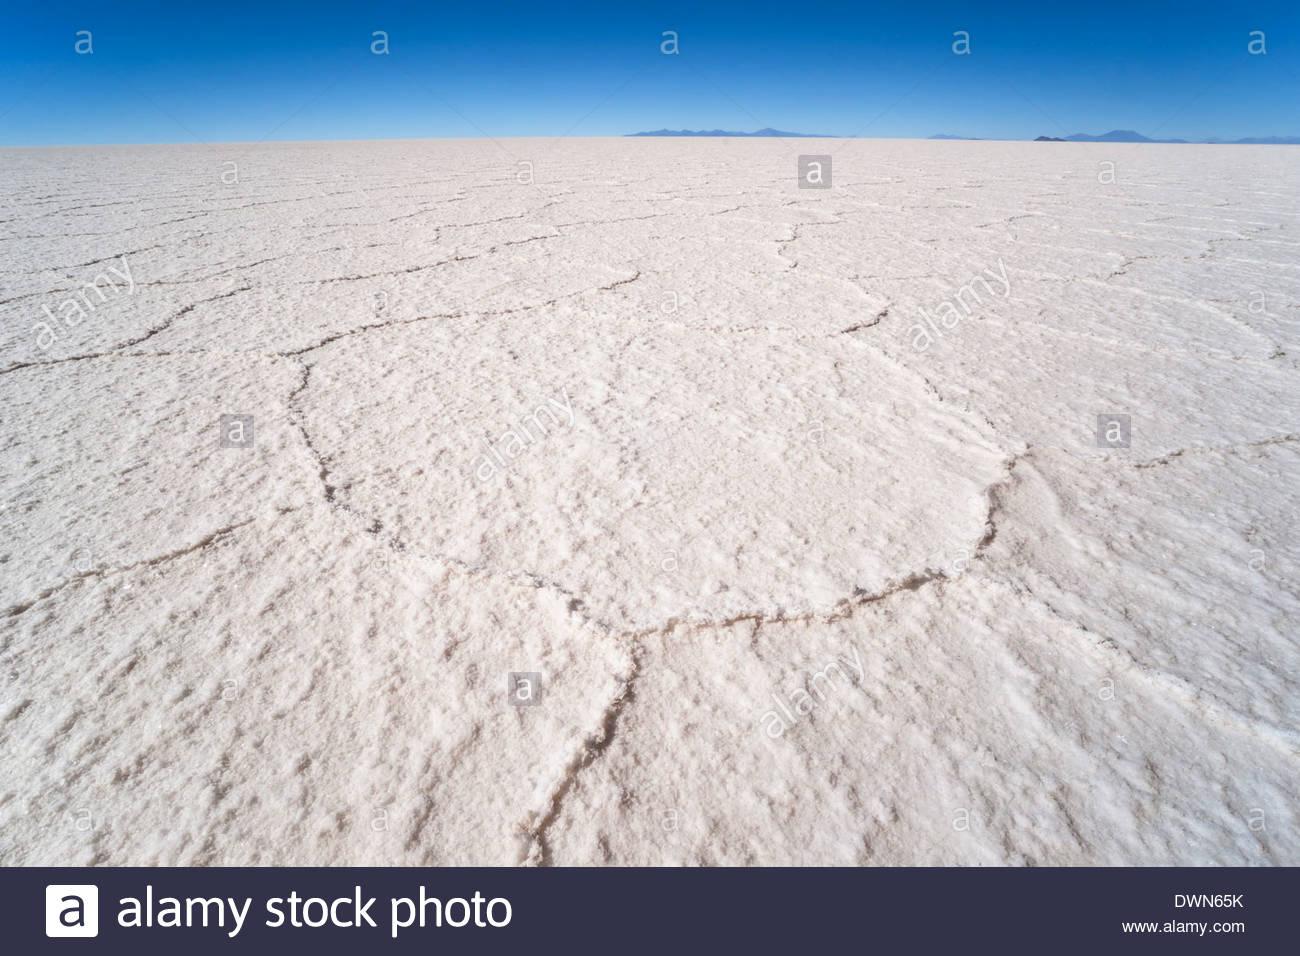 Hexagonal shaped salt flats, Salar de Uyuni, Bolivia, South America - Stock Image